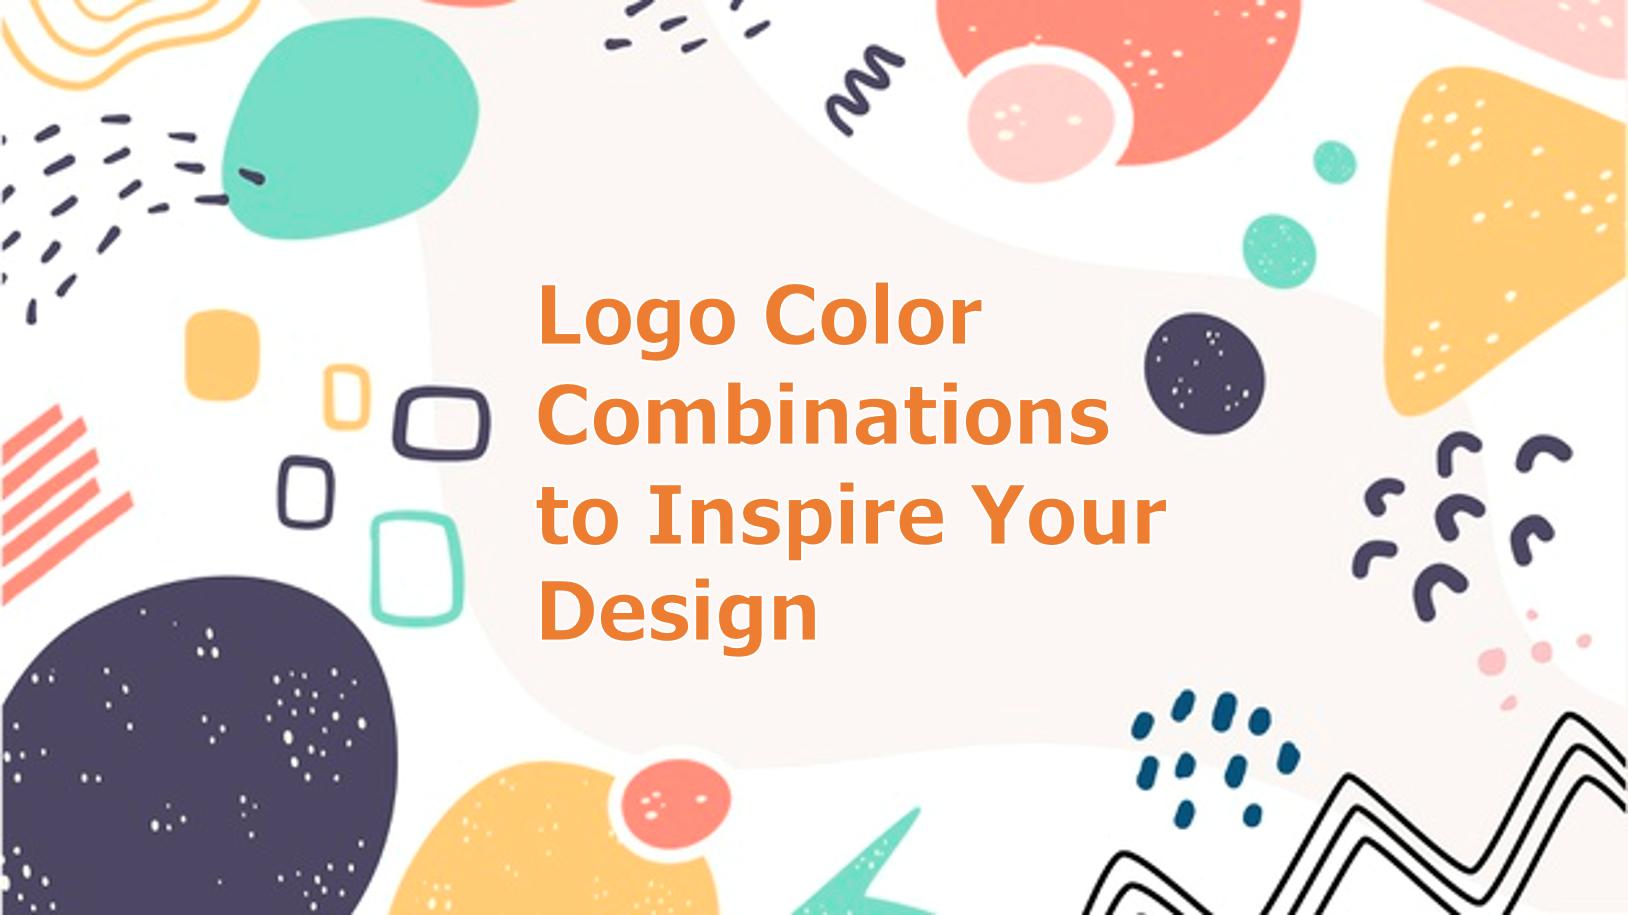 printingnews-B0040-01 paperbox好文分享-創造吸引人的logo顏色組合